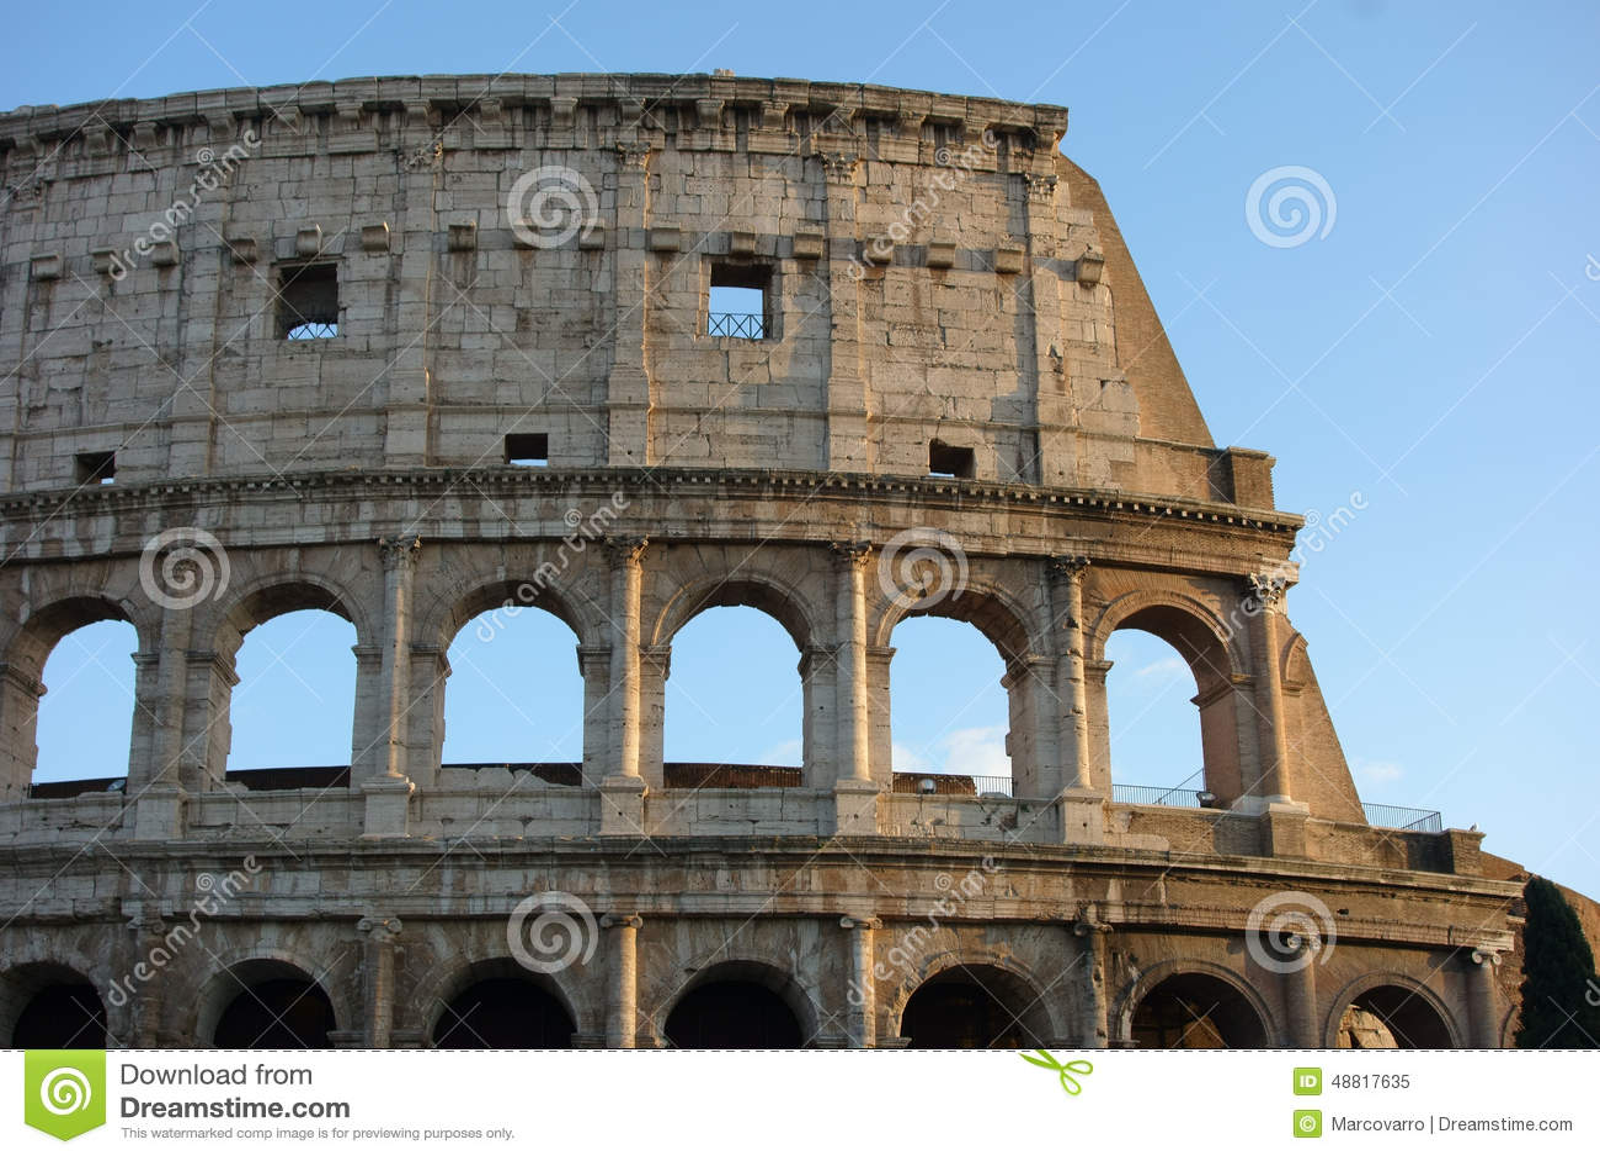 Detalle Del Coliseo Roma Italia Imagen Editorial Imagen De